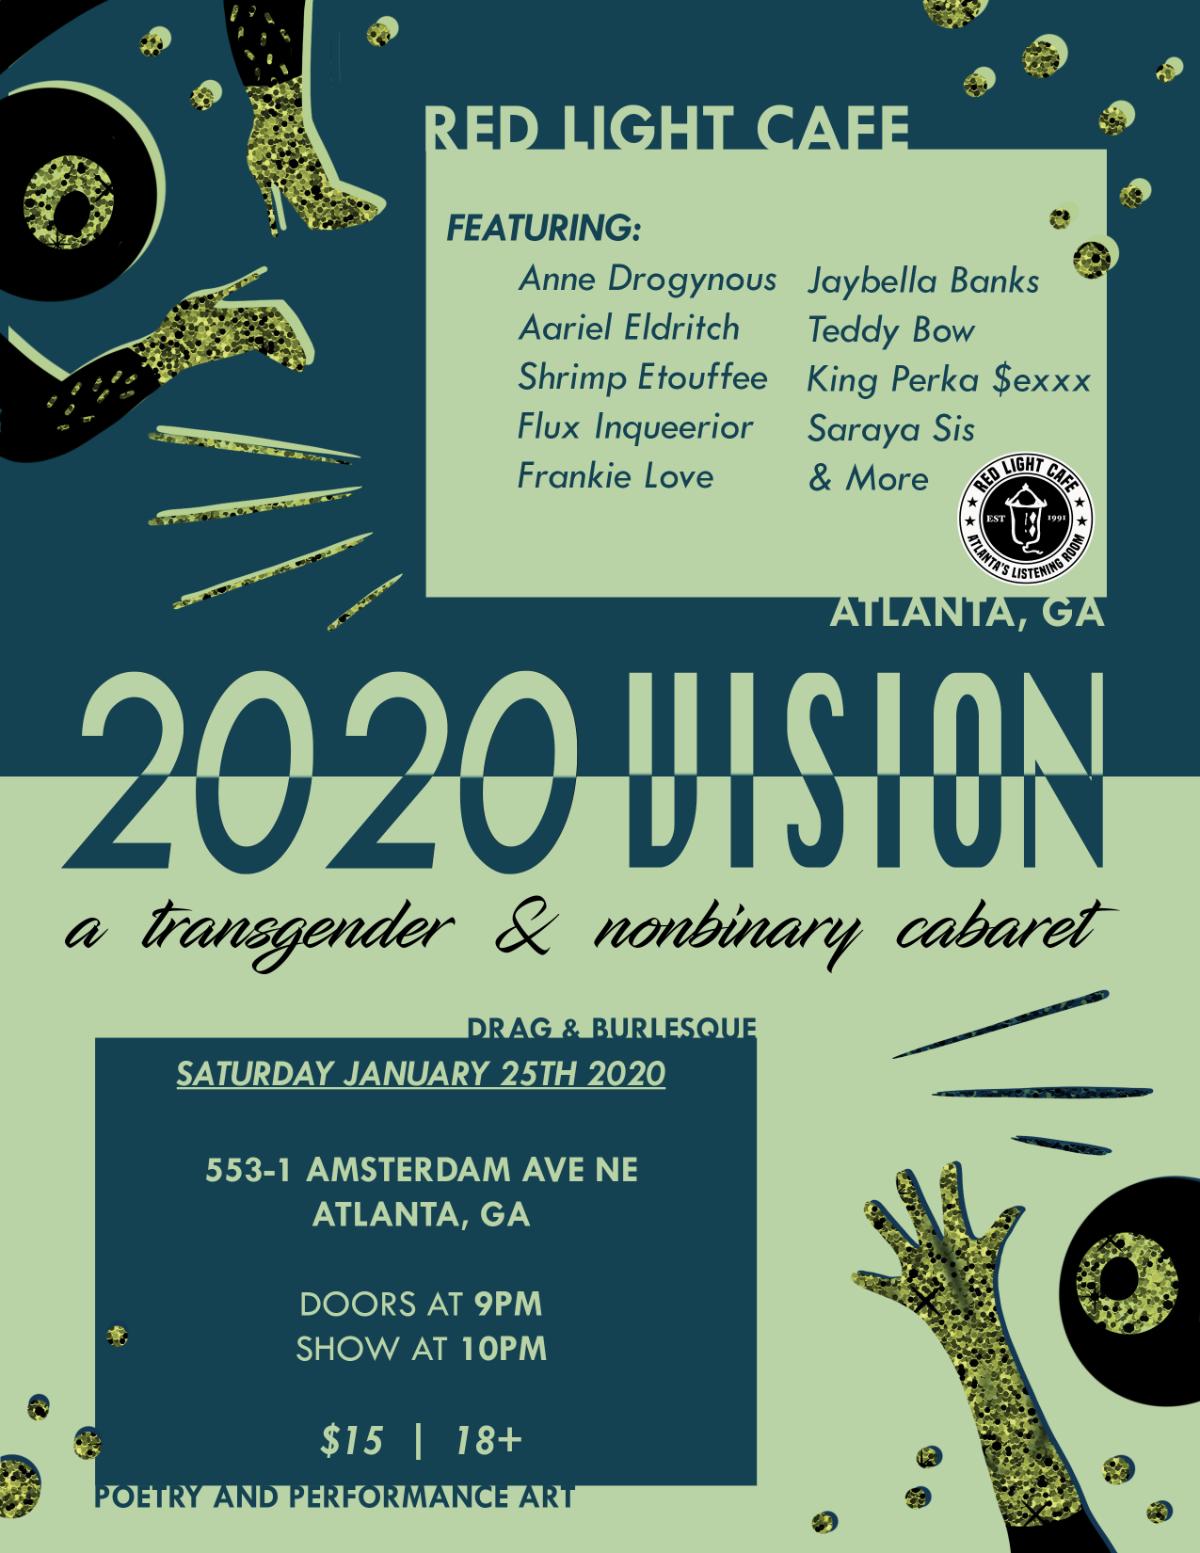 2020 Vision: A Transgender and Non-Binary Cabaret Showcase — January 25, 2020 — Red Light Café, Atlanta, GA